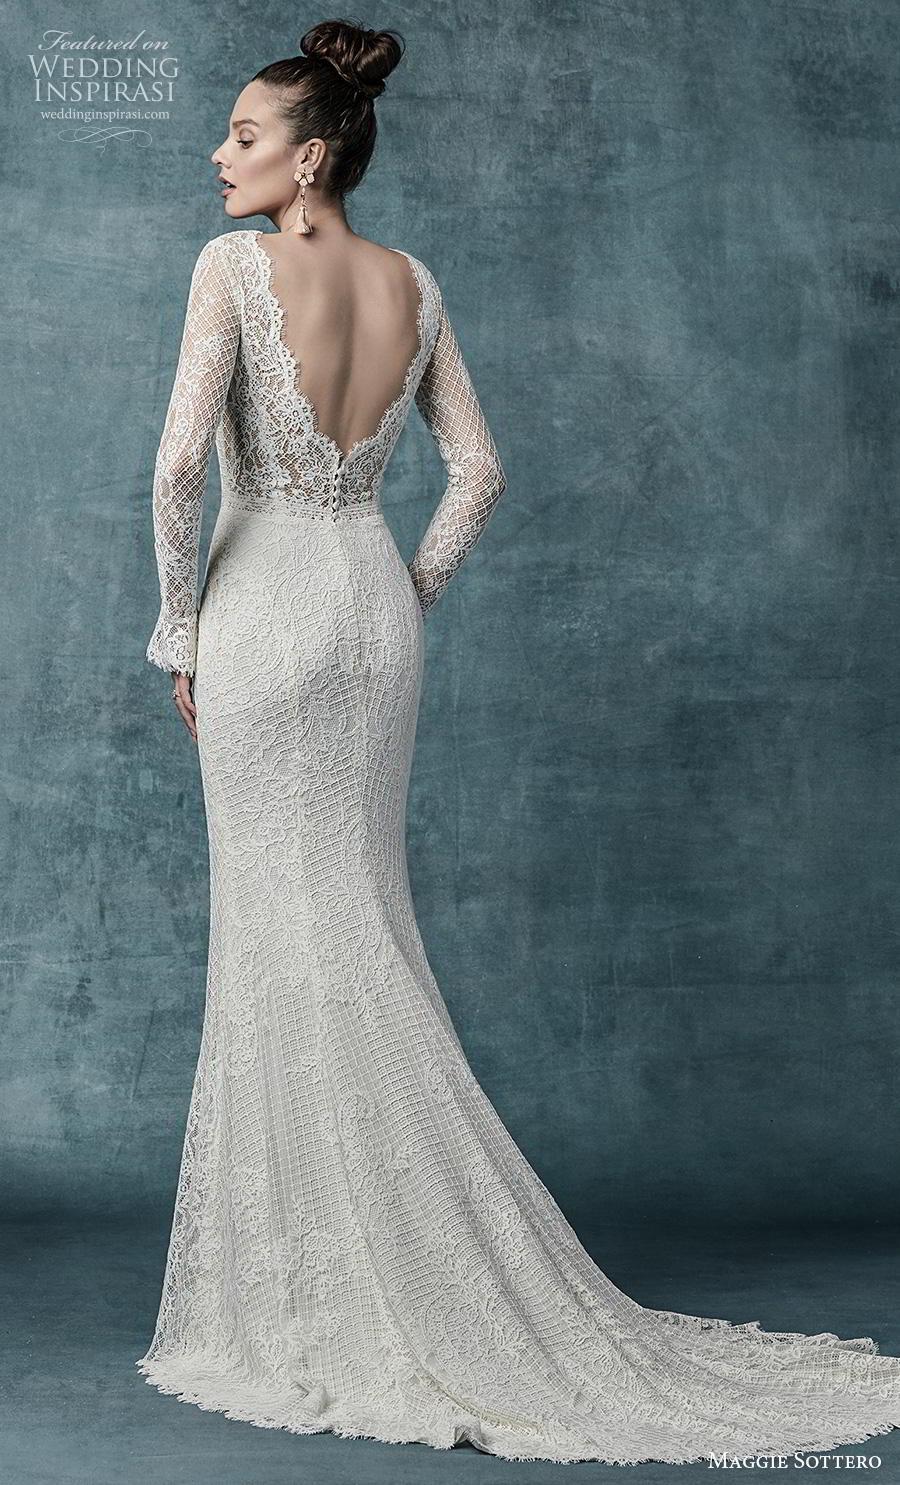 maggie sottero spring 2019 bridal long sleeves v neck full embellishment elegant fit and flare wedding dress backless v back medium train (14) bv